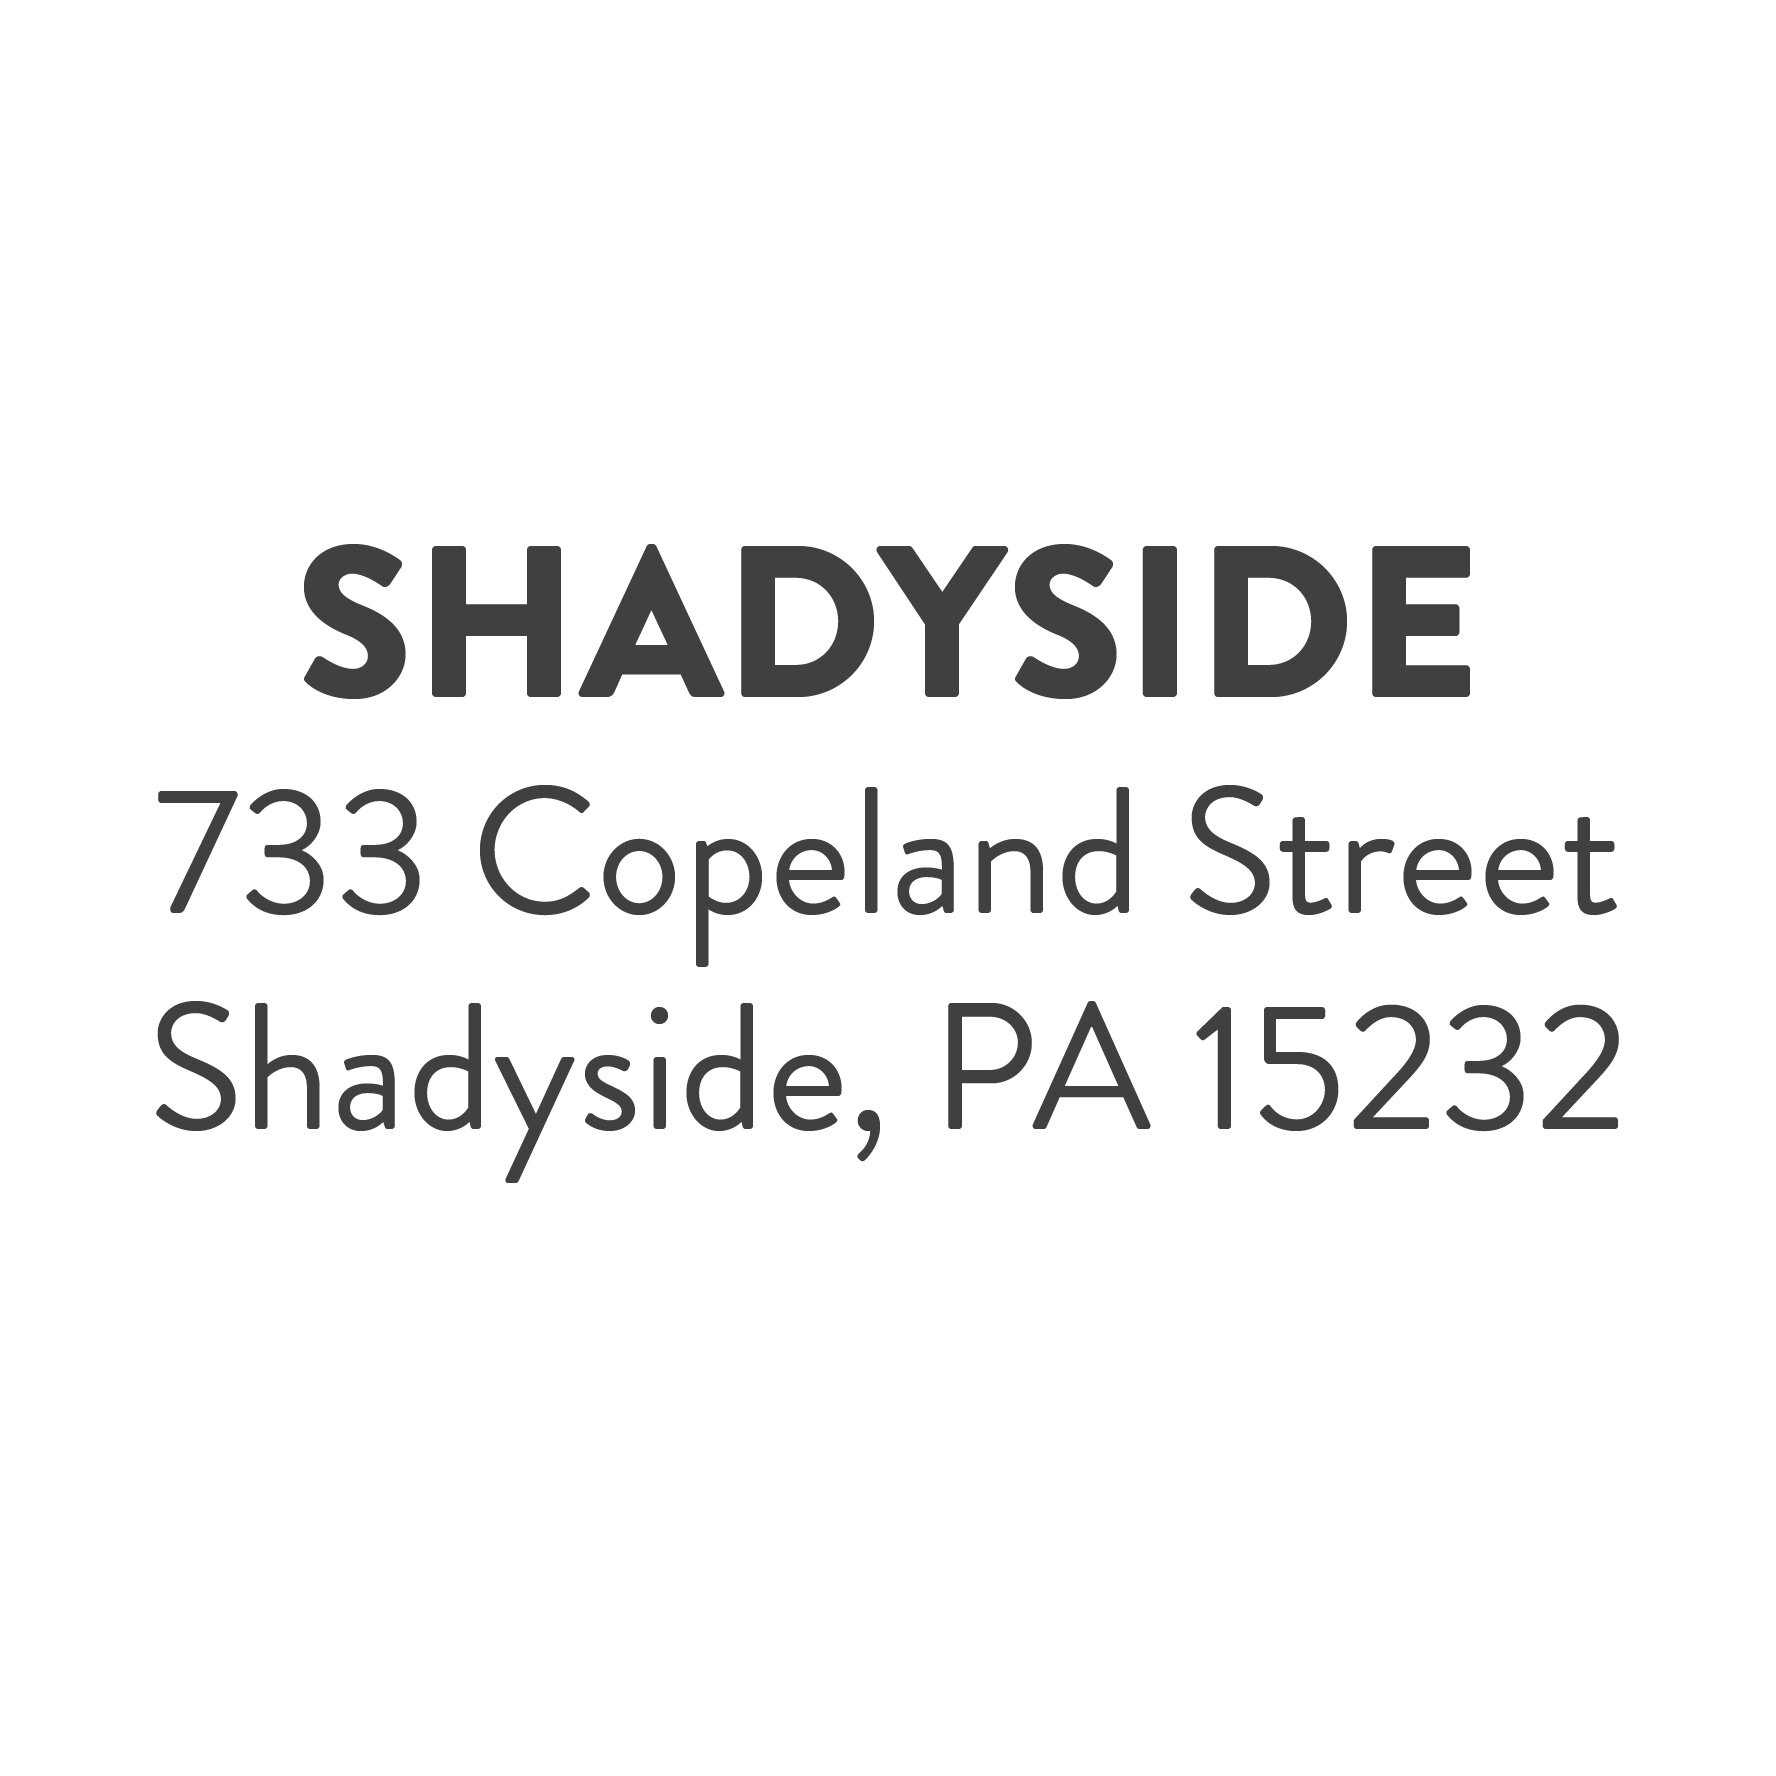 Shadyside.jpg